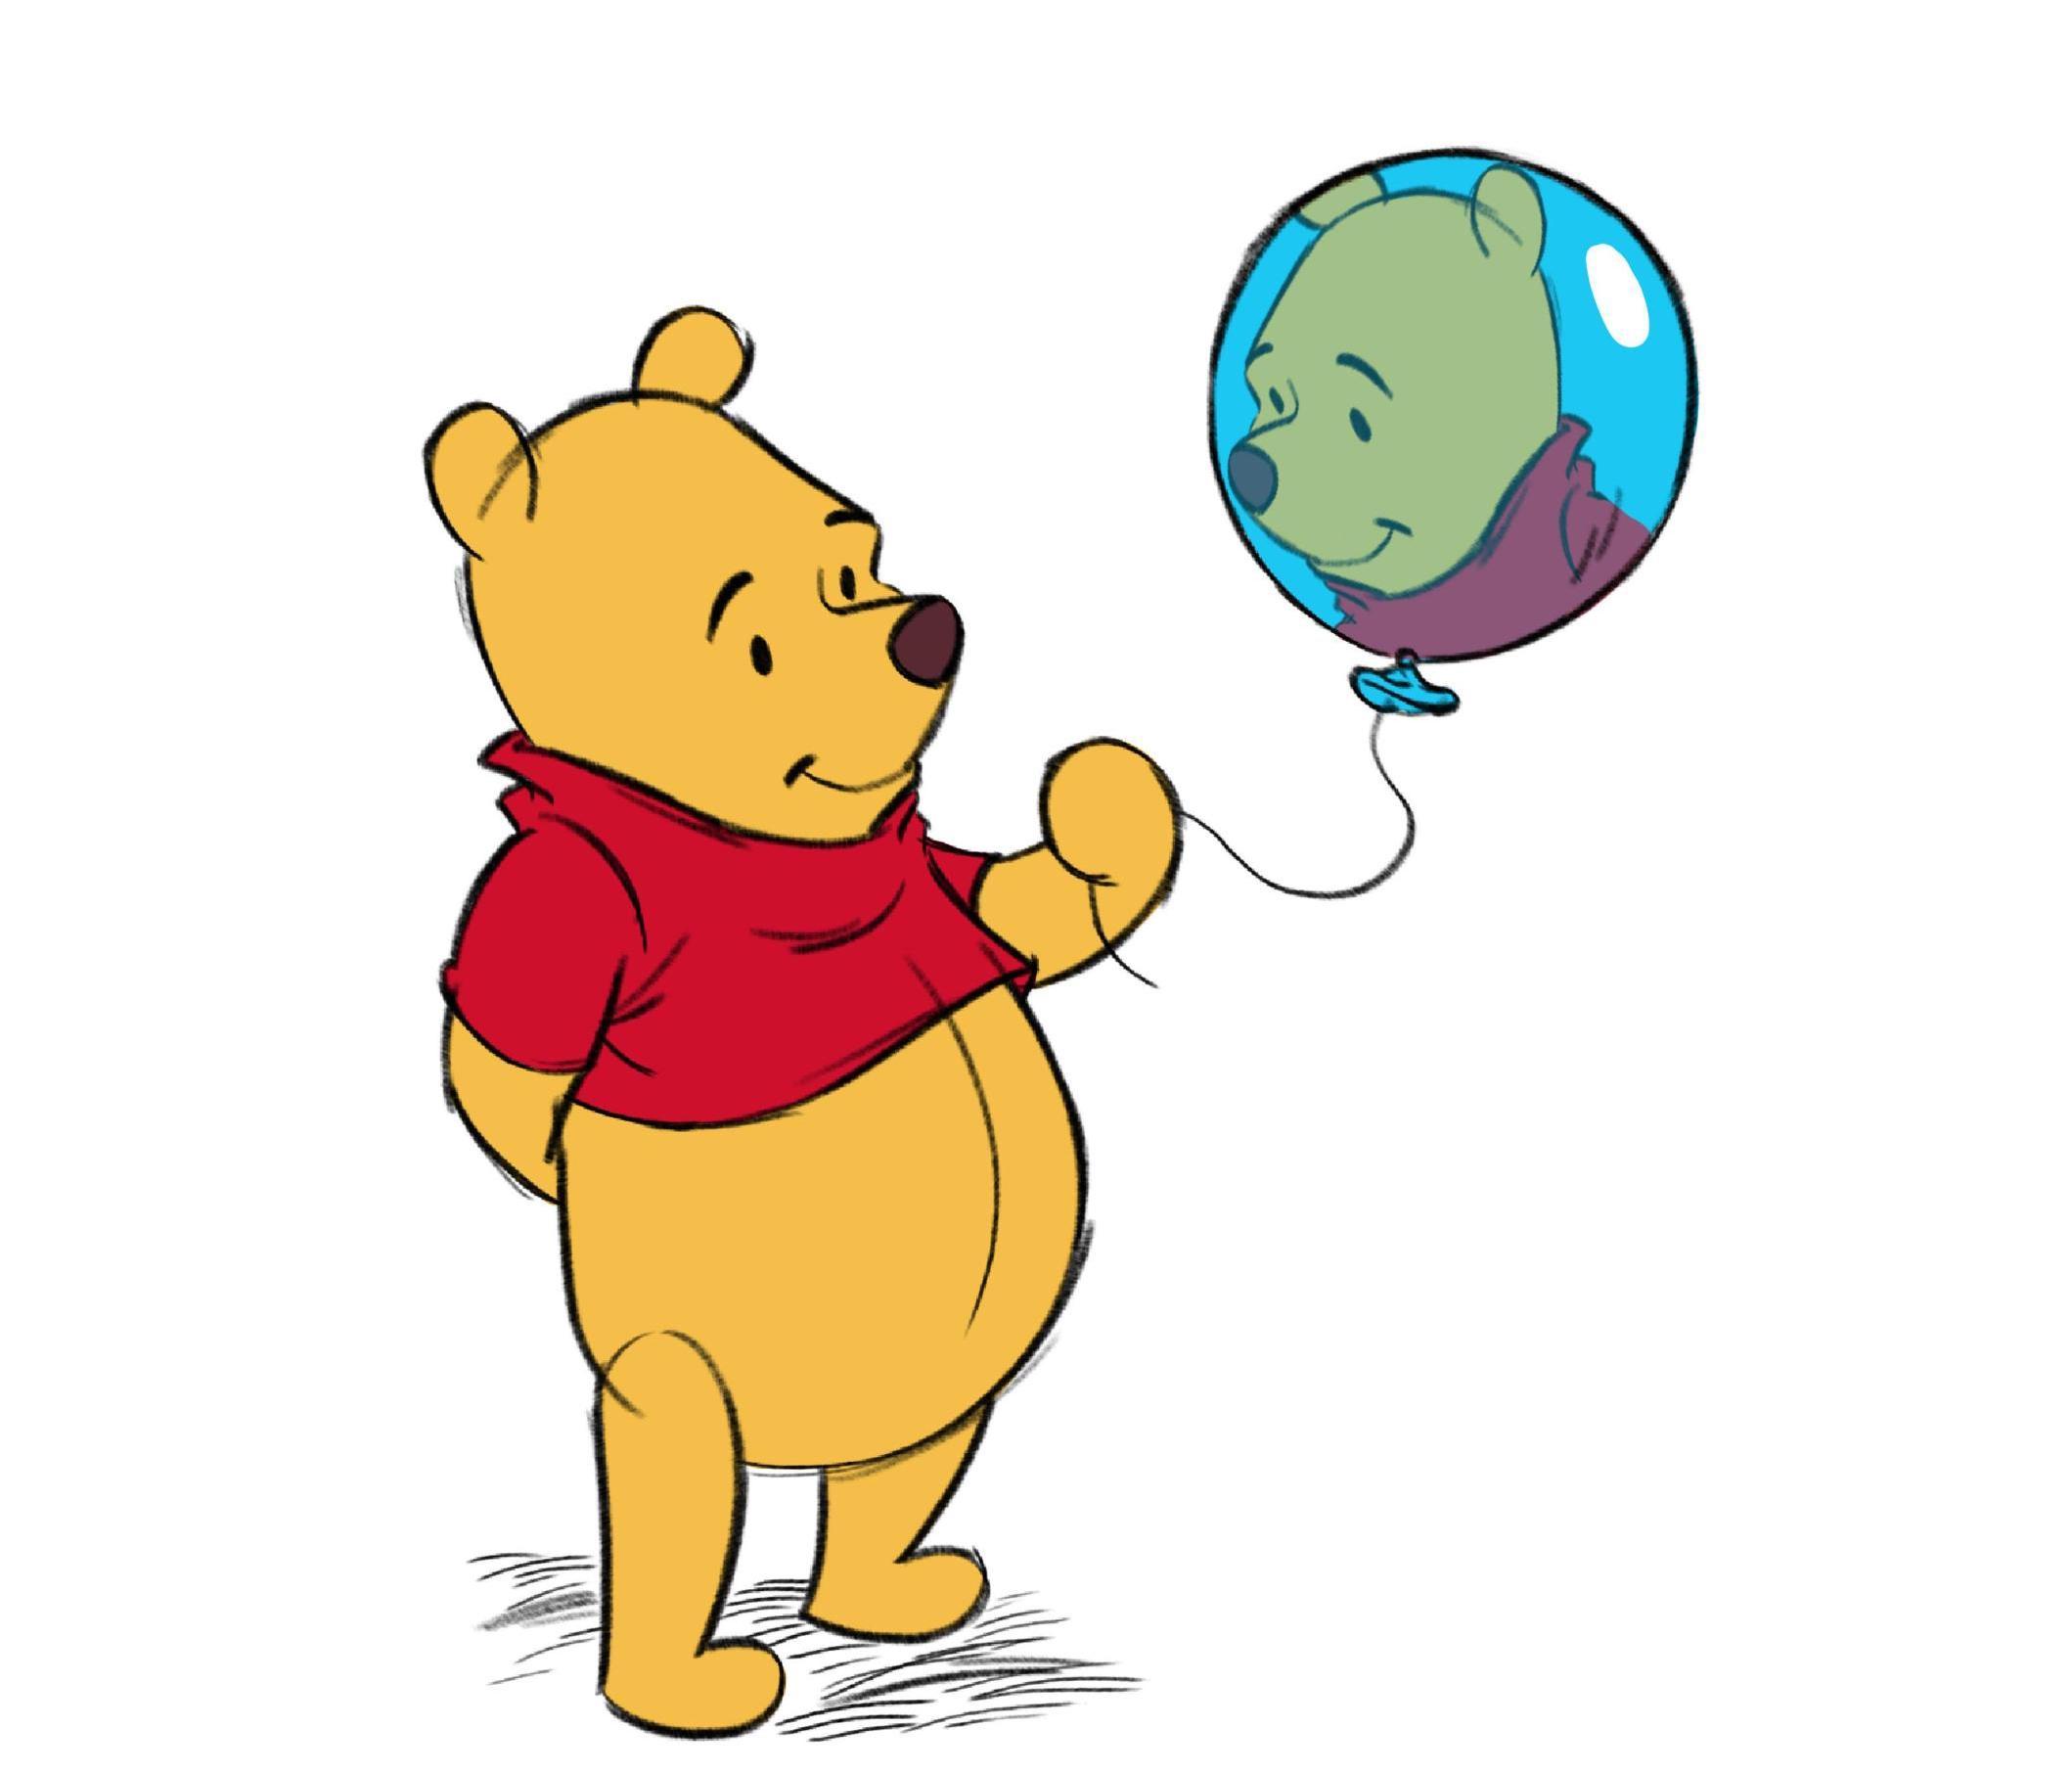 I 90 anni di Winnie The Pooh, dalla penna di Milne a Disney